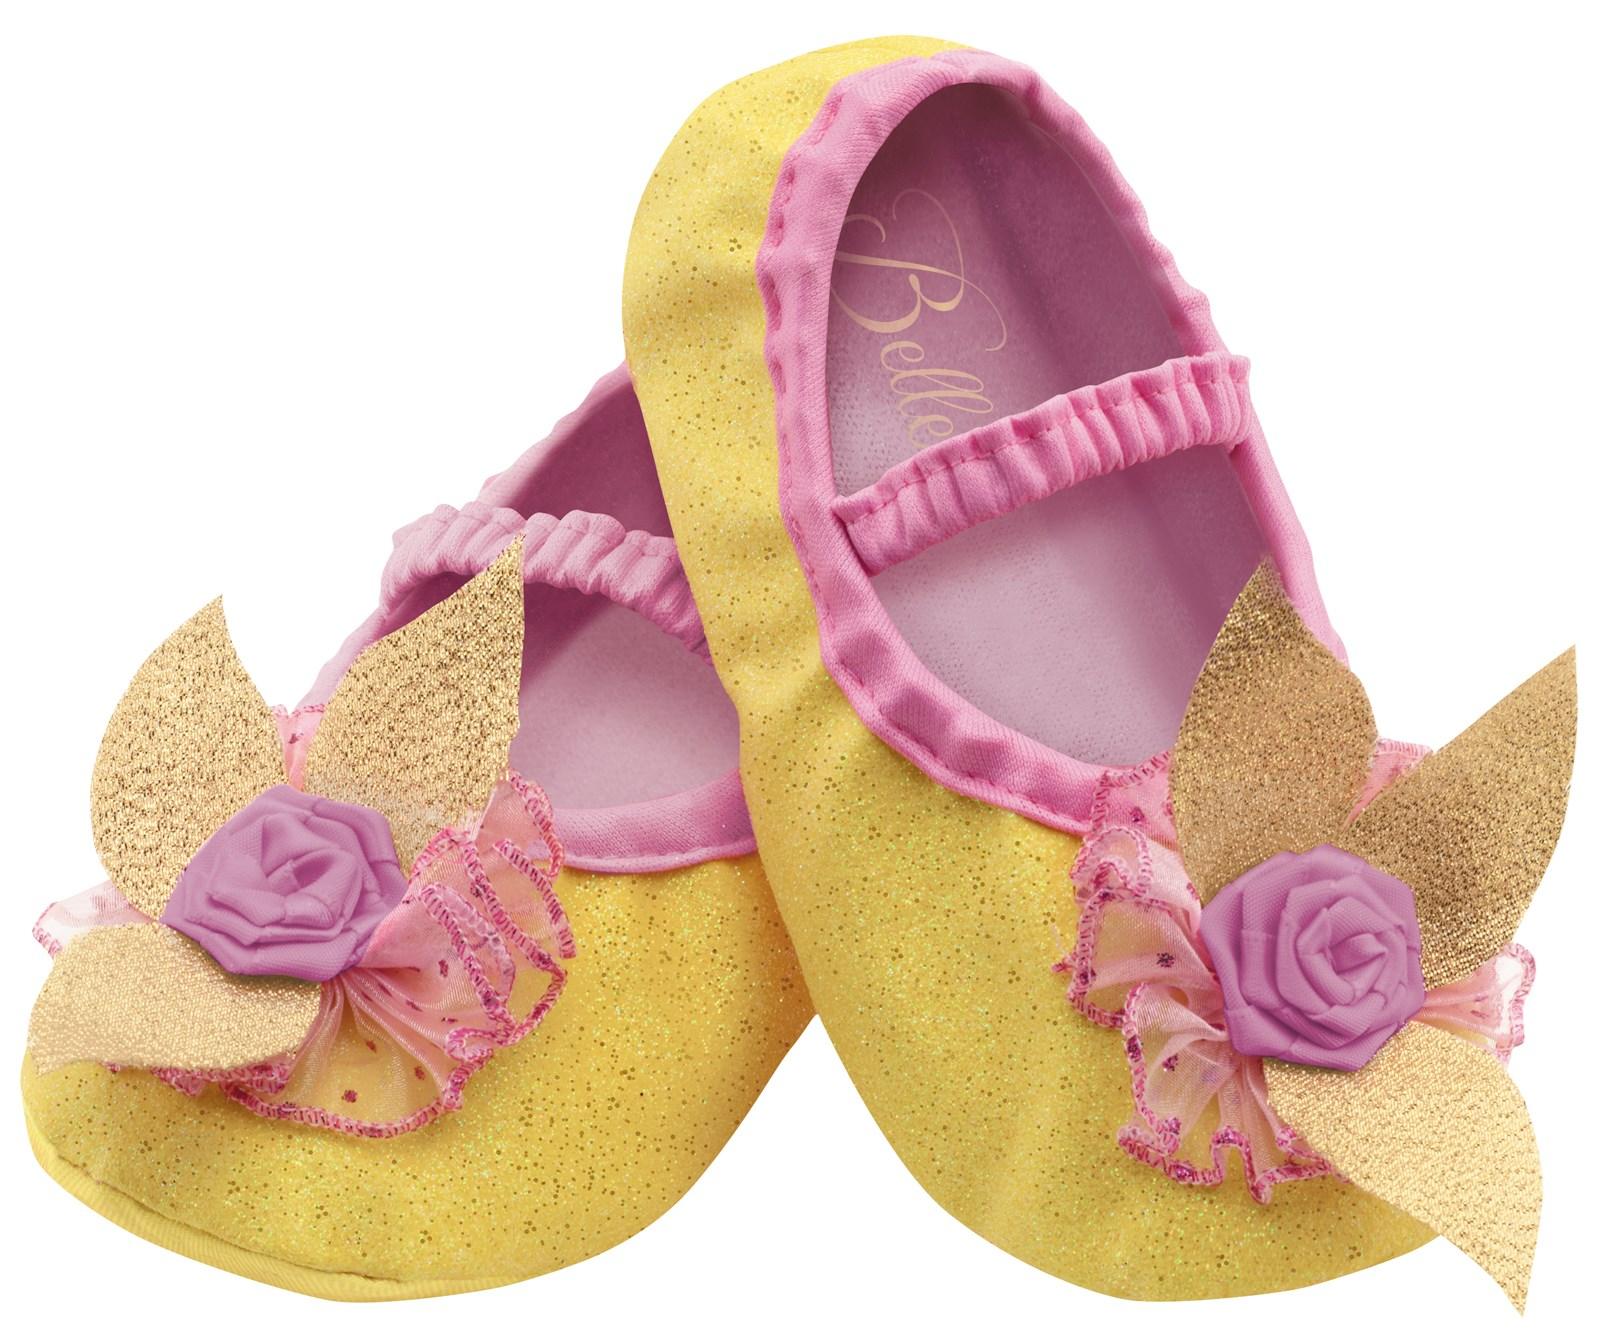 Disney Princess Toddler Belle Slippers